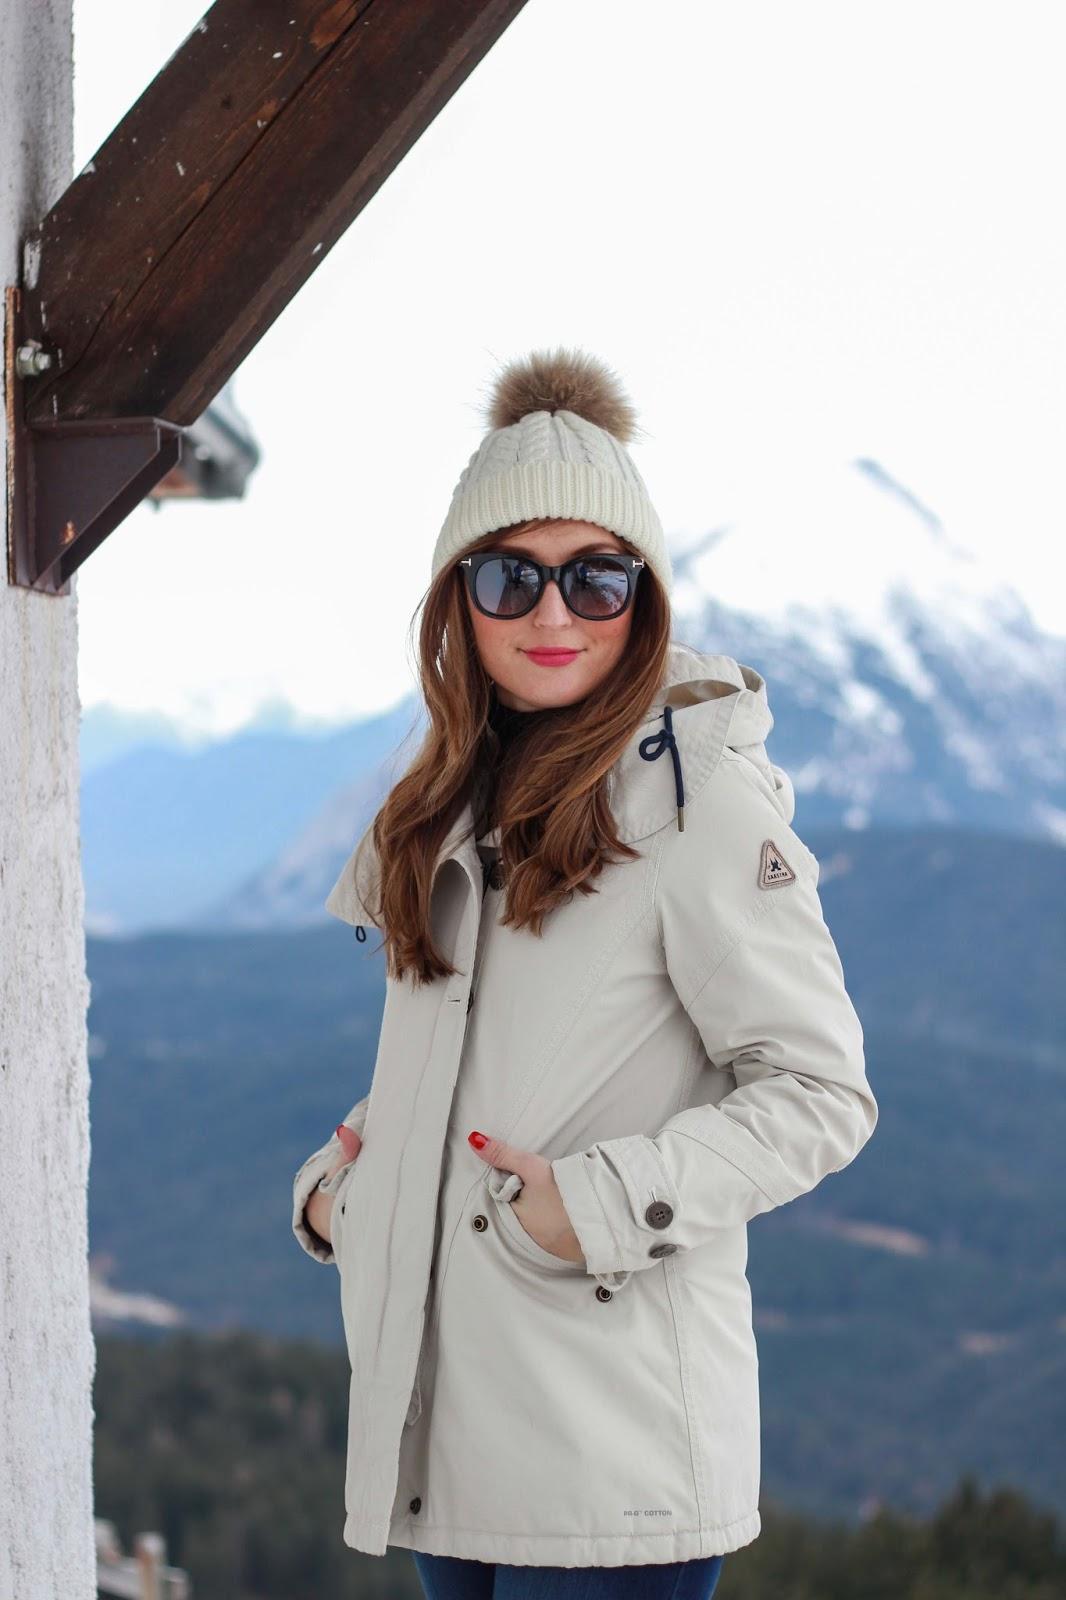 Gaastra Jacke - Outdoor Jacke - Fashionblogger Outdoor - Modeblogger - Fashionblogger aus Deutschland - Deutsche Fashionblogger - German Fashionblogger - Gaastra Rafting Jacke